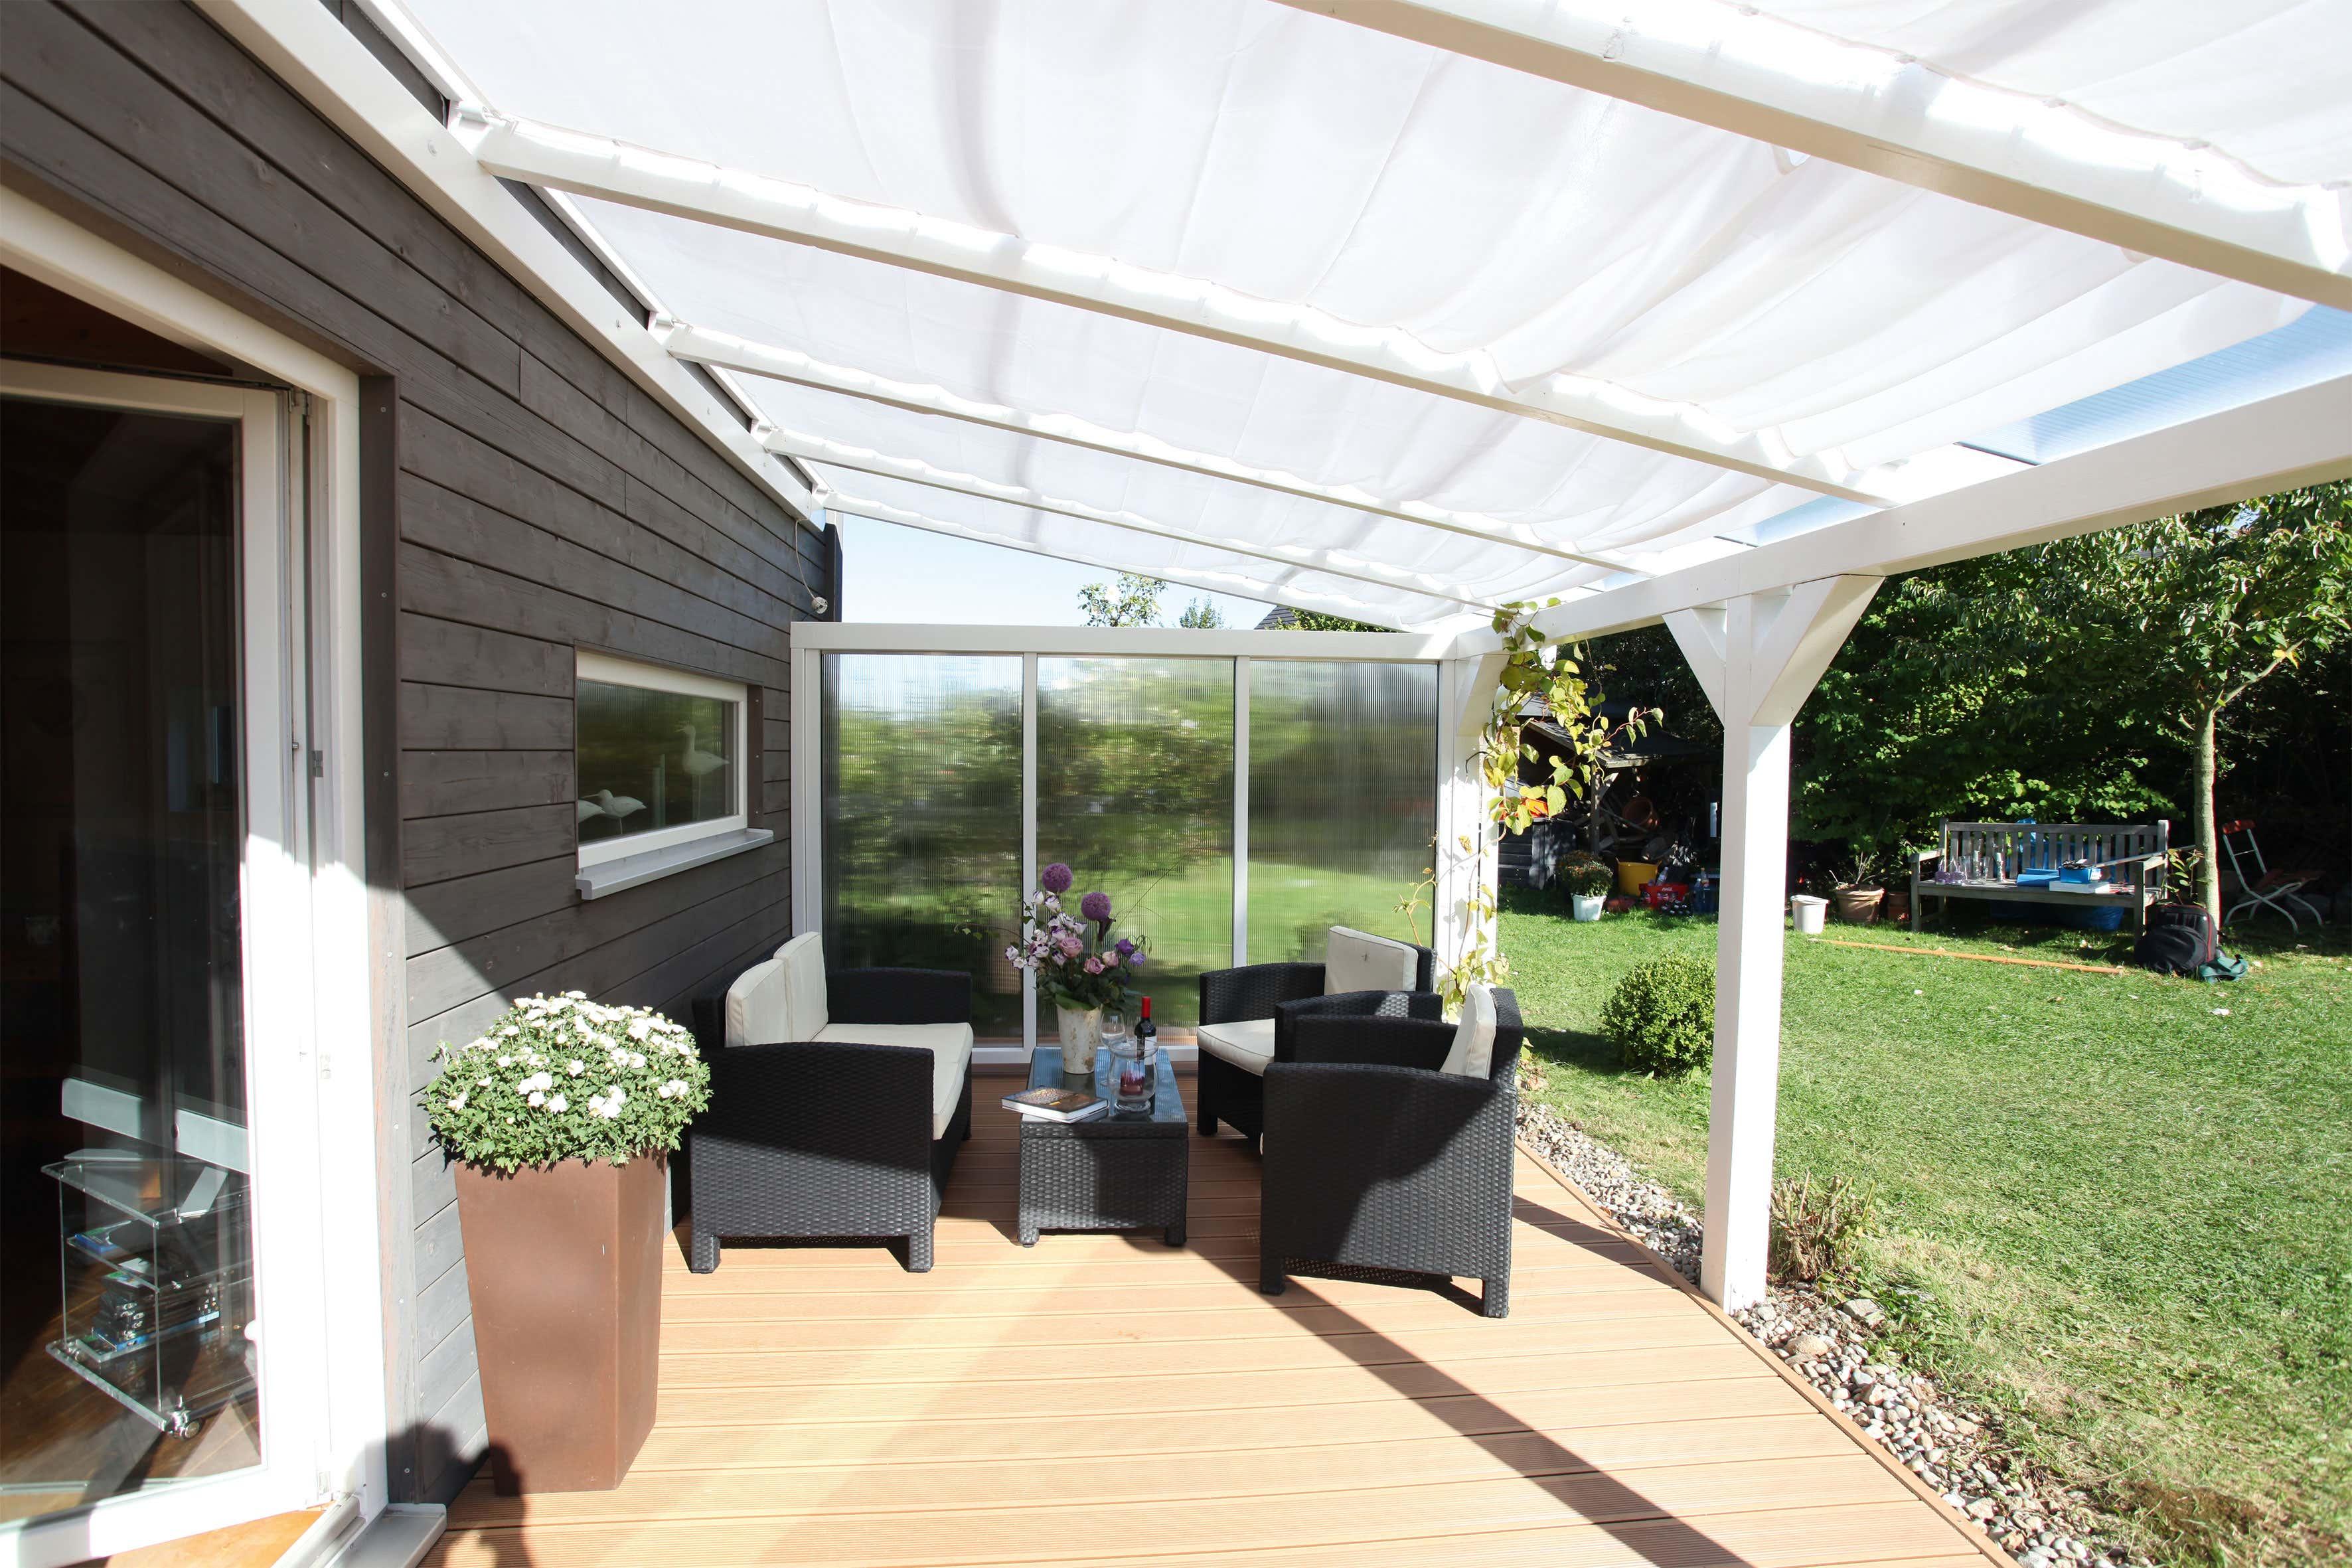 TerrassenUberdachung Holz Polycarbonat ~   Terrassenüberdachung aus Polycarbonat 250cm  A Z Gartenhaus GmbH